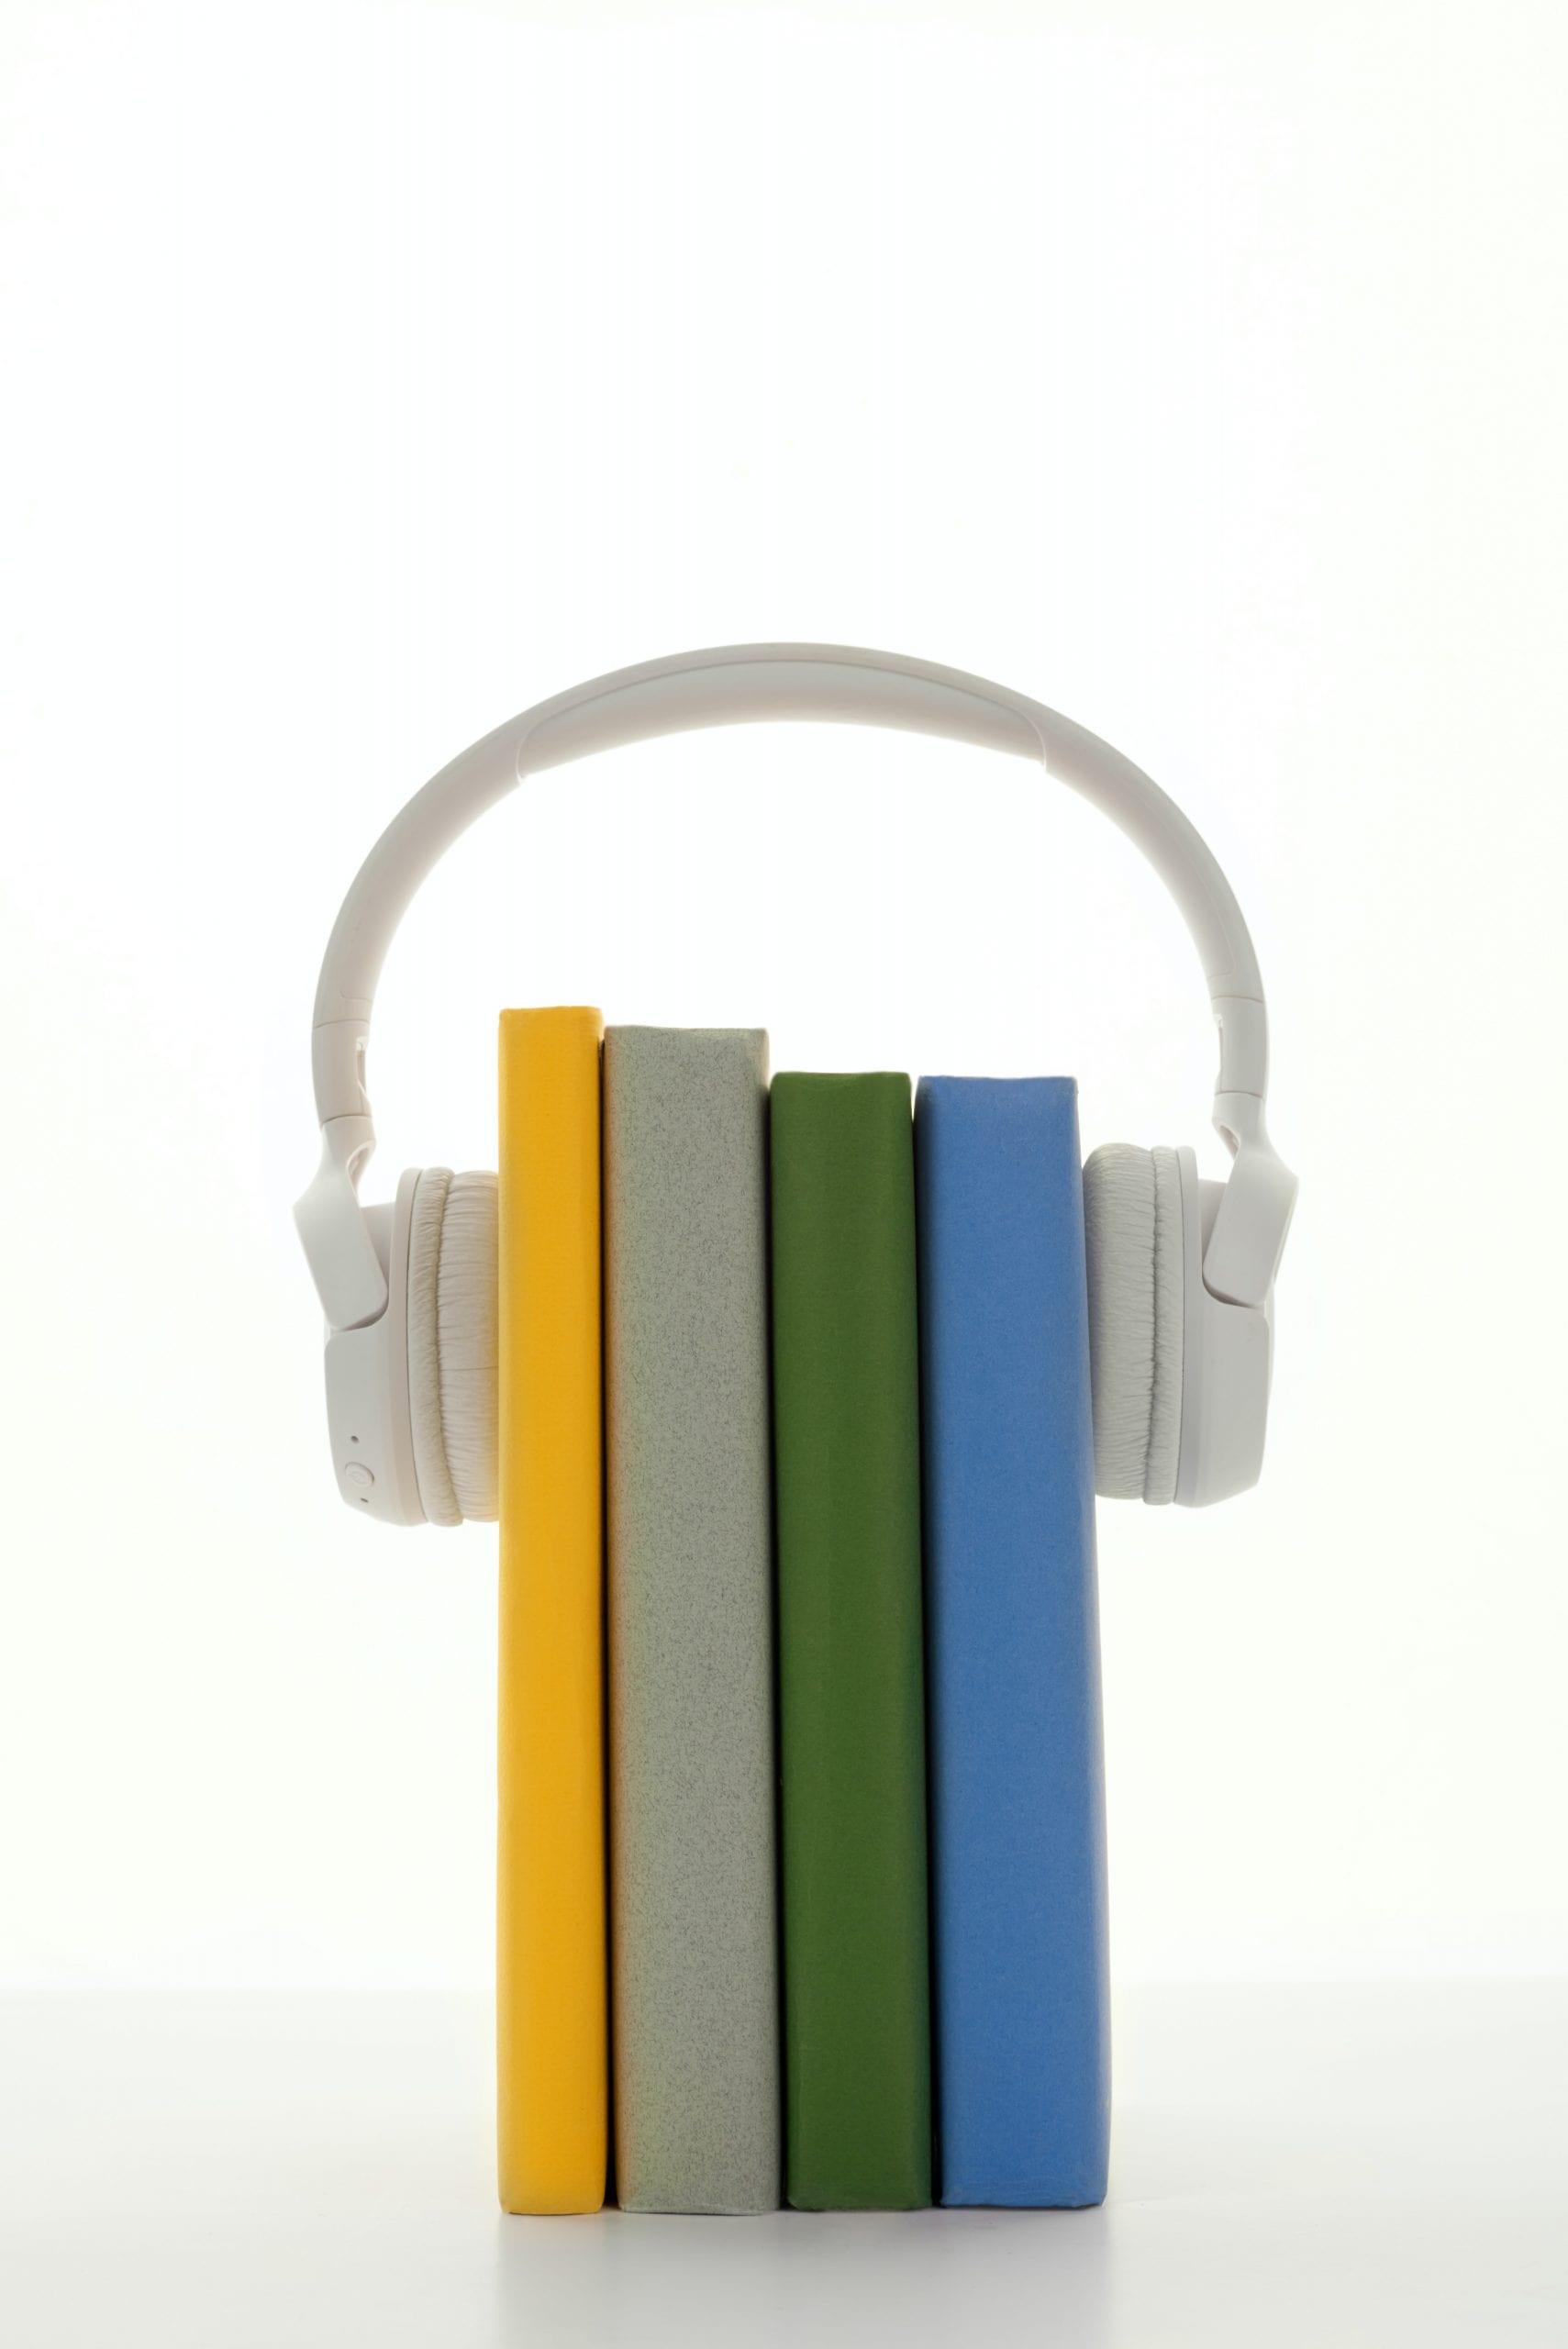 headphones on top of books